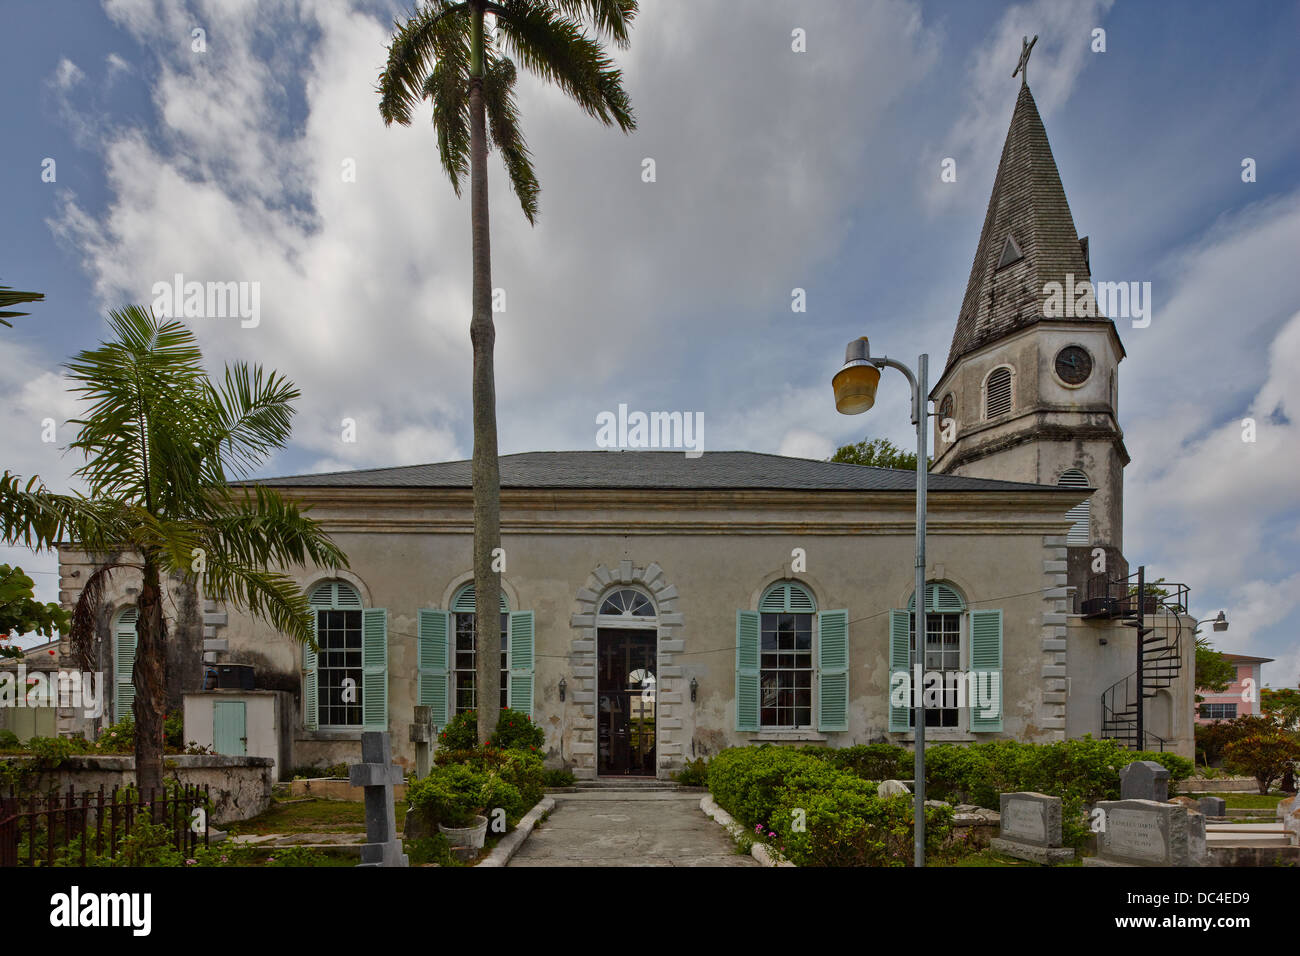 St Matthews Anglican Church, Nassau, New Providence Island, Bahamas - Stock Image